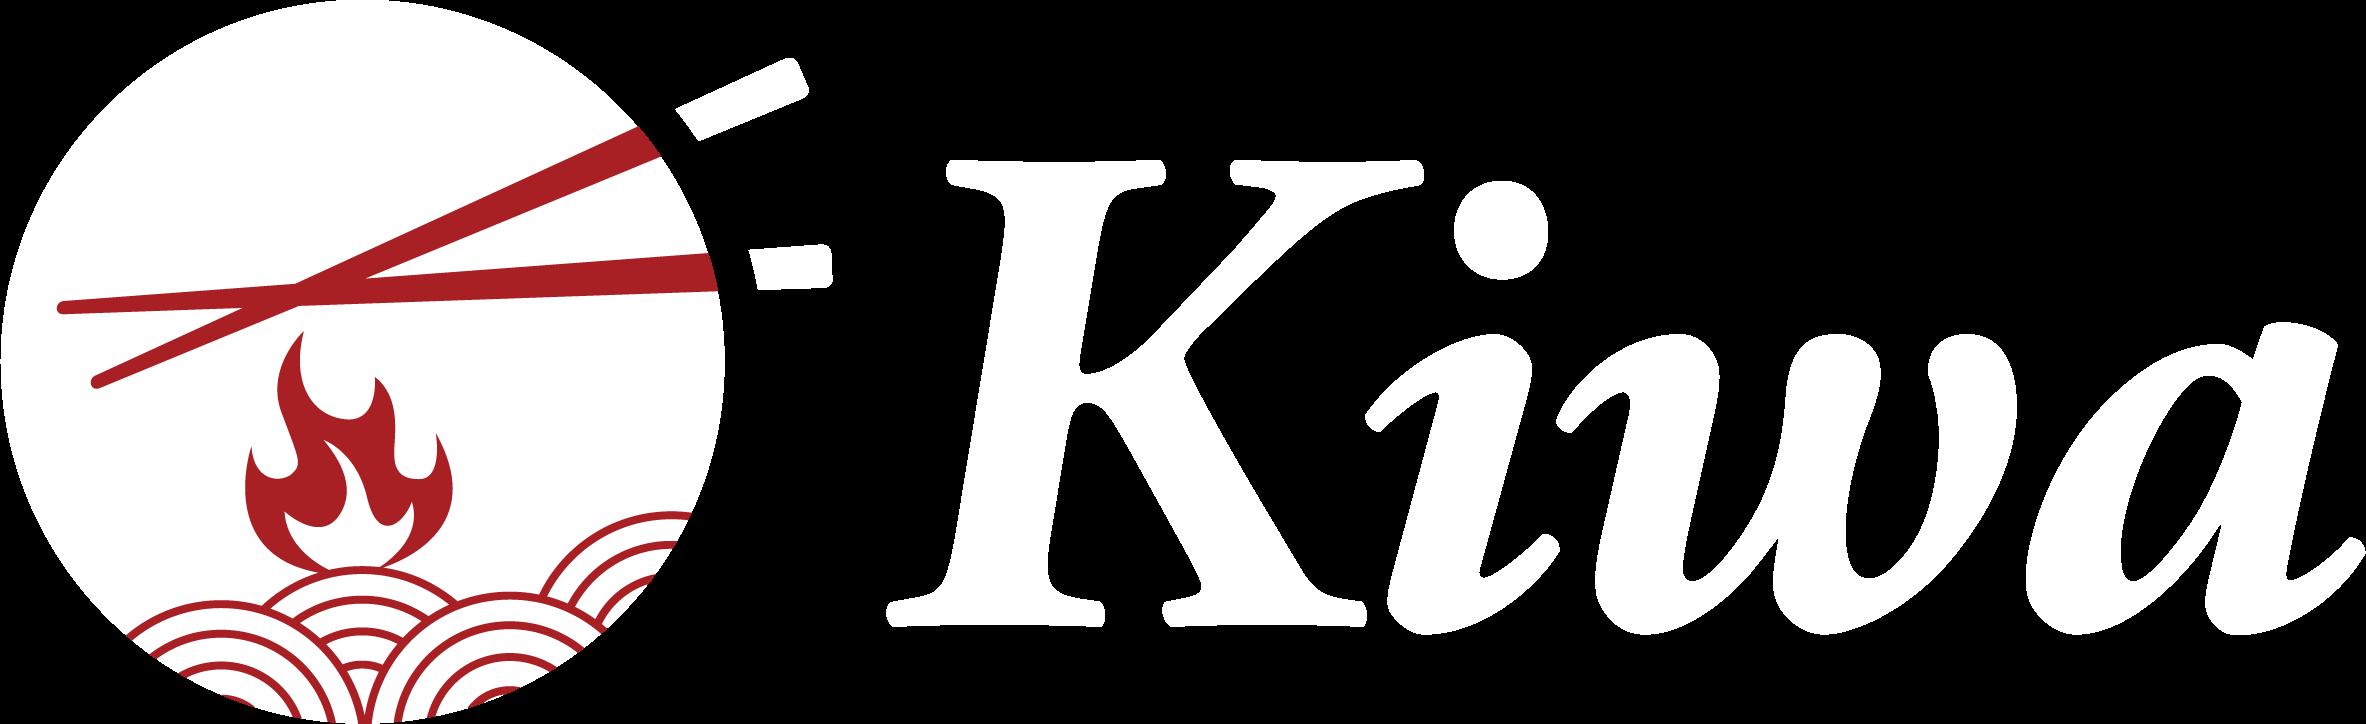 RESTAURANT KIWA